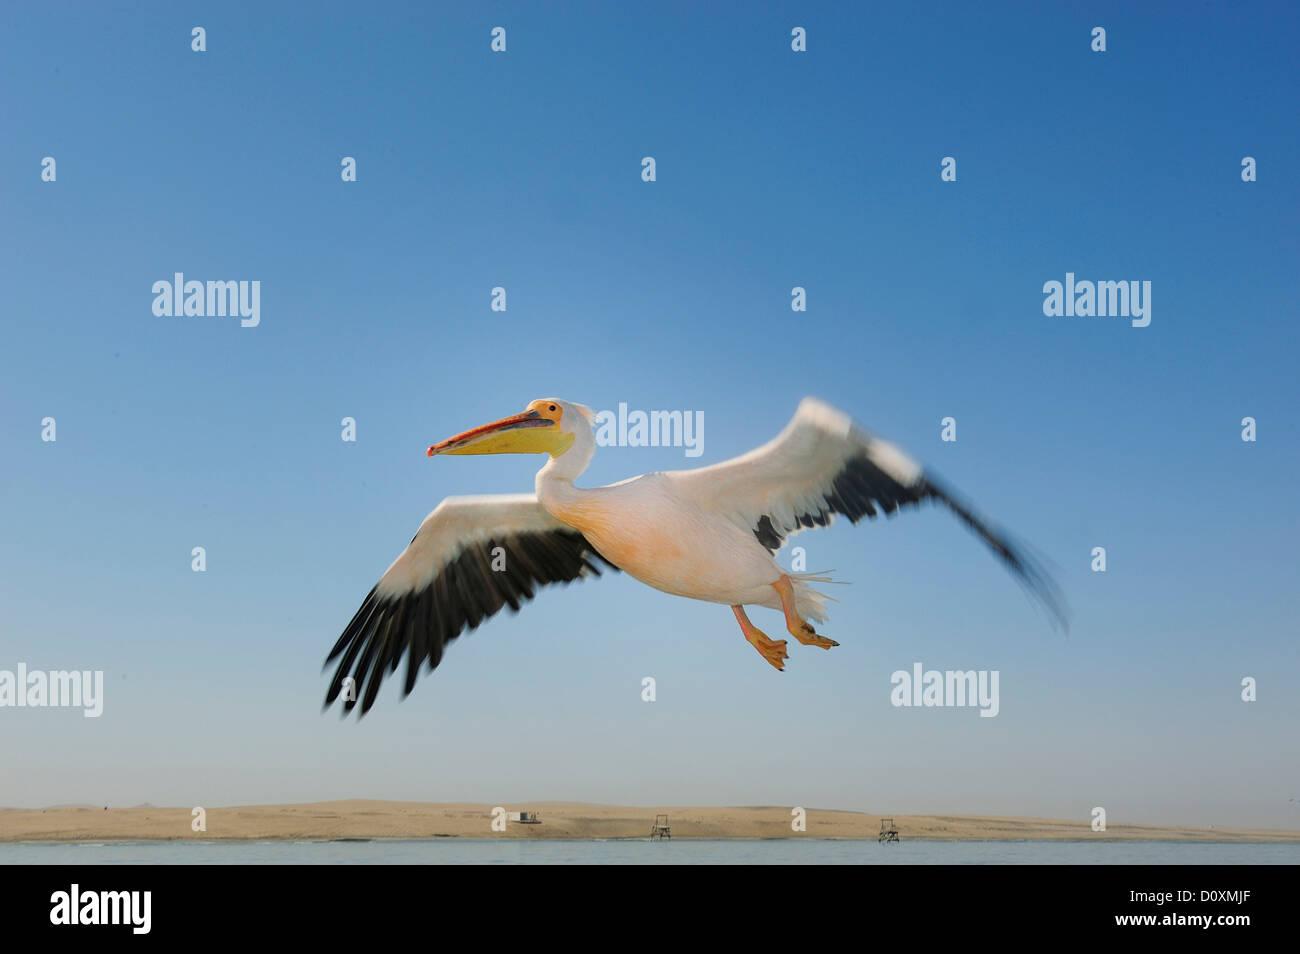 Africa, Namibia, Walvis Bay, Pelican, bird, flying - Stock Image